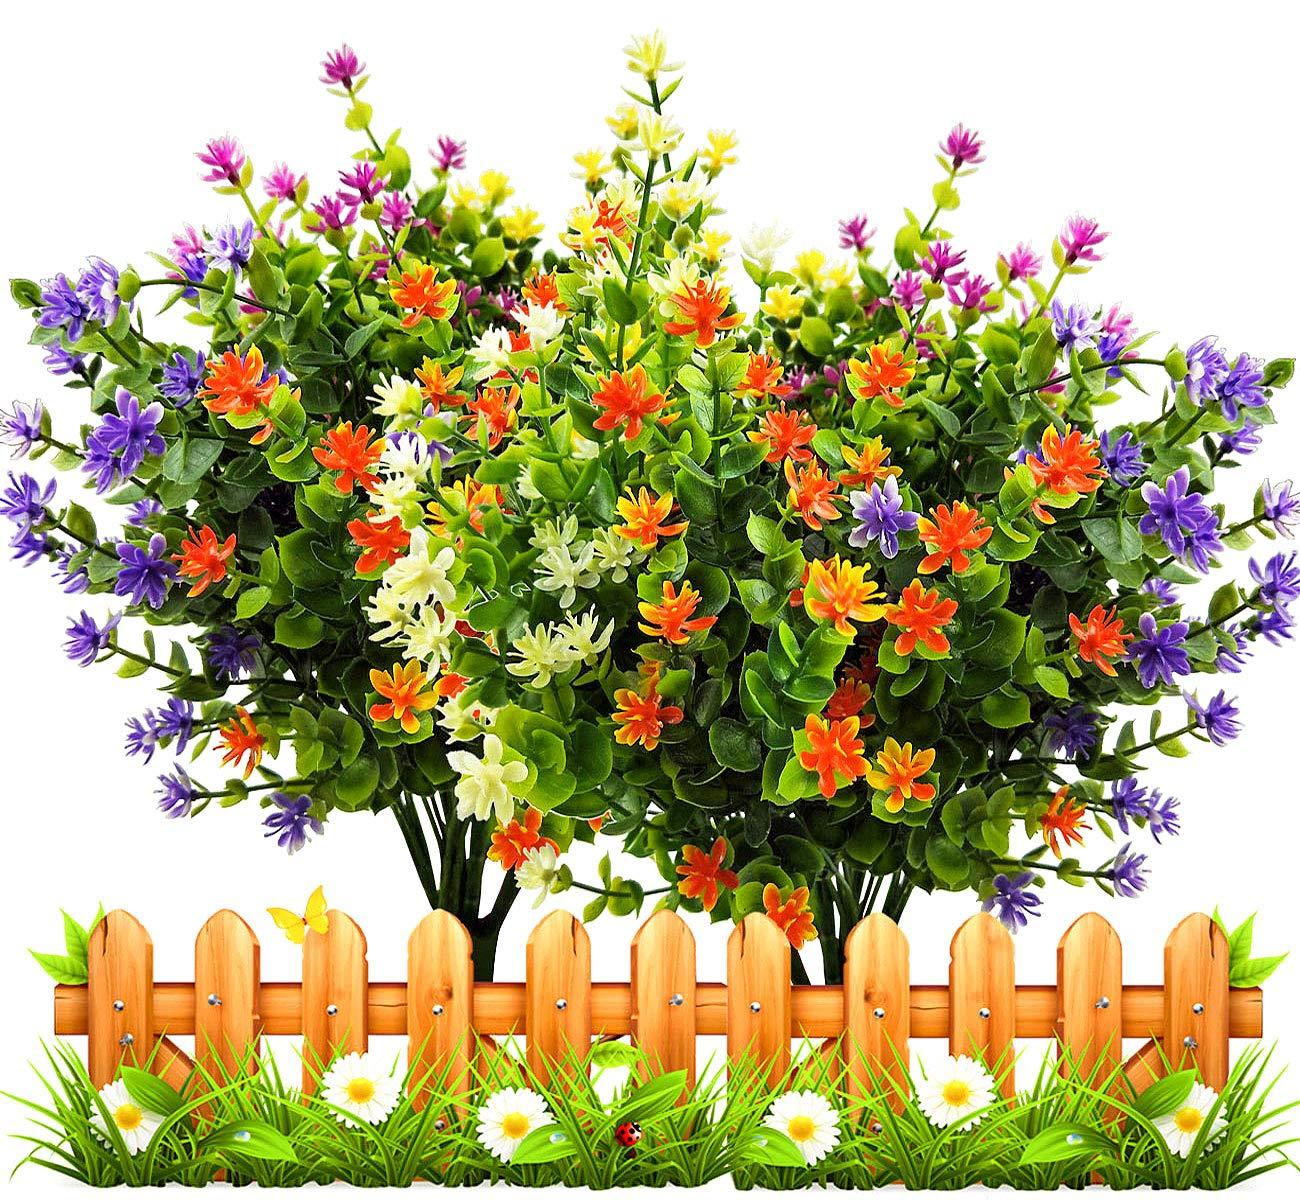 LUCKY-SNAIL-Artificial-Fake-Flowers-Faux-Outdoor-UV-Resistant-Boxwood-Shrubs-Plants-Lifelike-Plastic-Silk-Flowers-for-Indoor-Outdoors-Home-Office-Garden-Wedding-Sidewalk-Trim-Decor